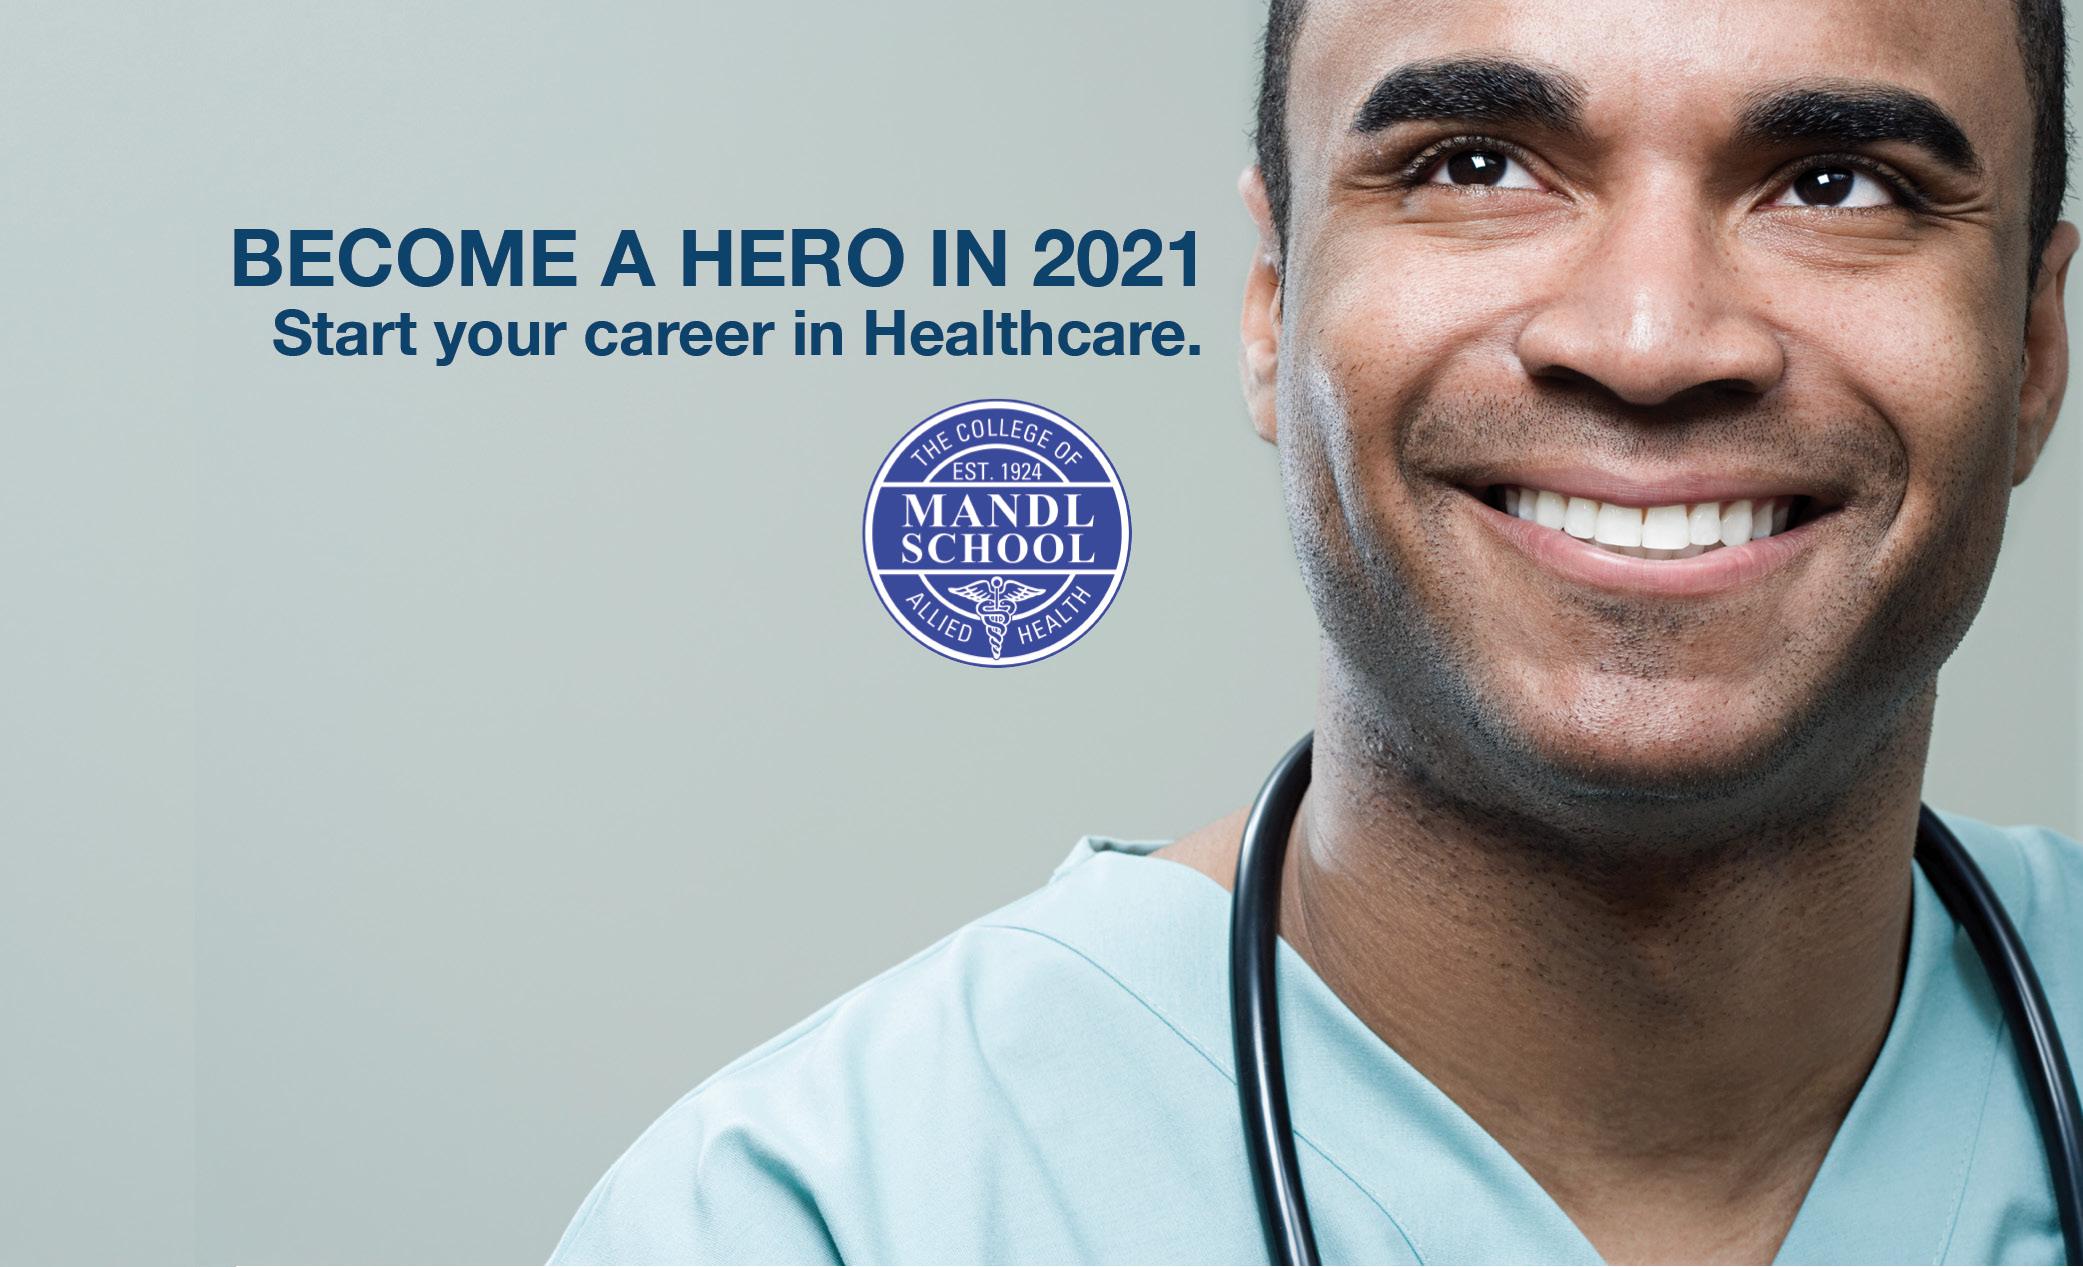 Smiling medical professional